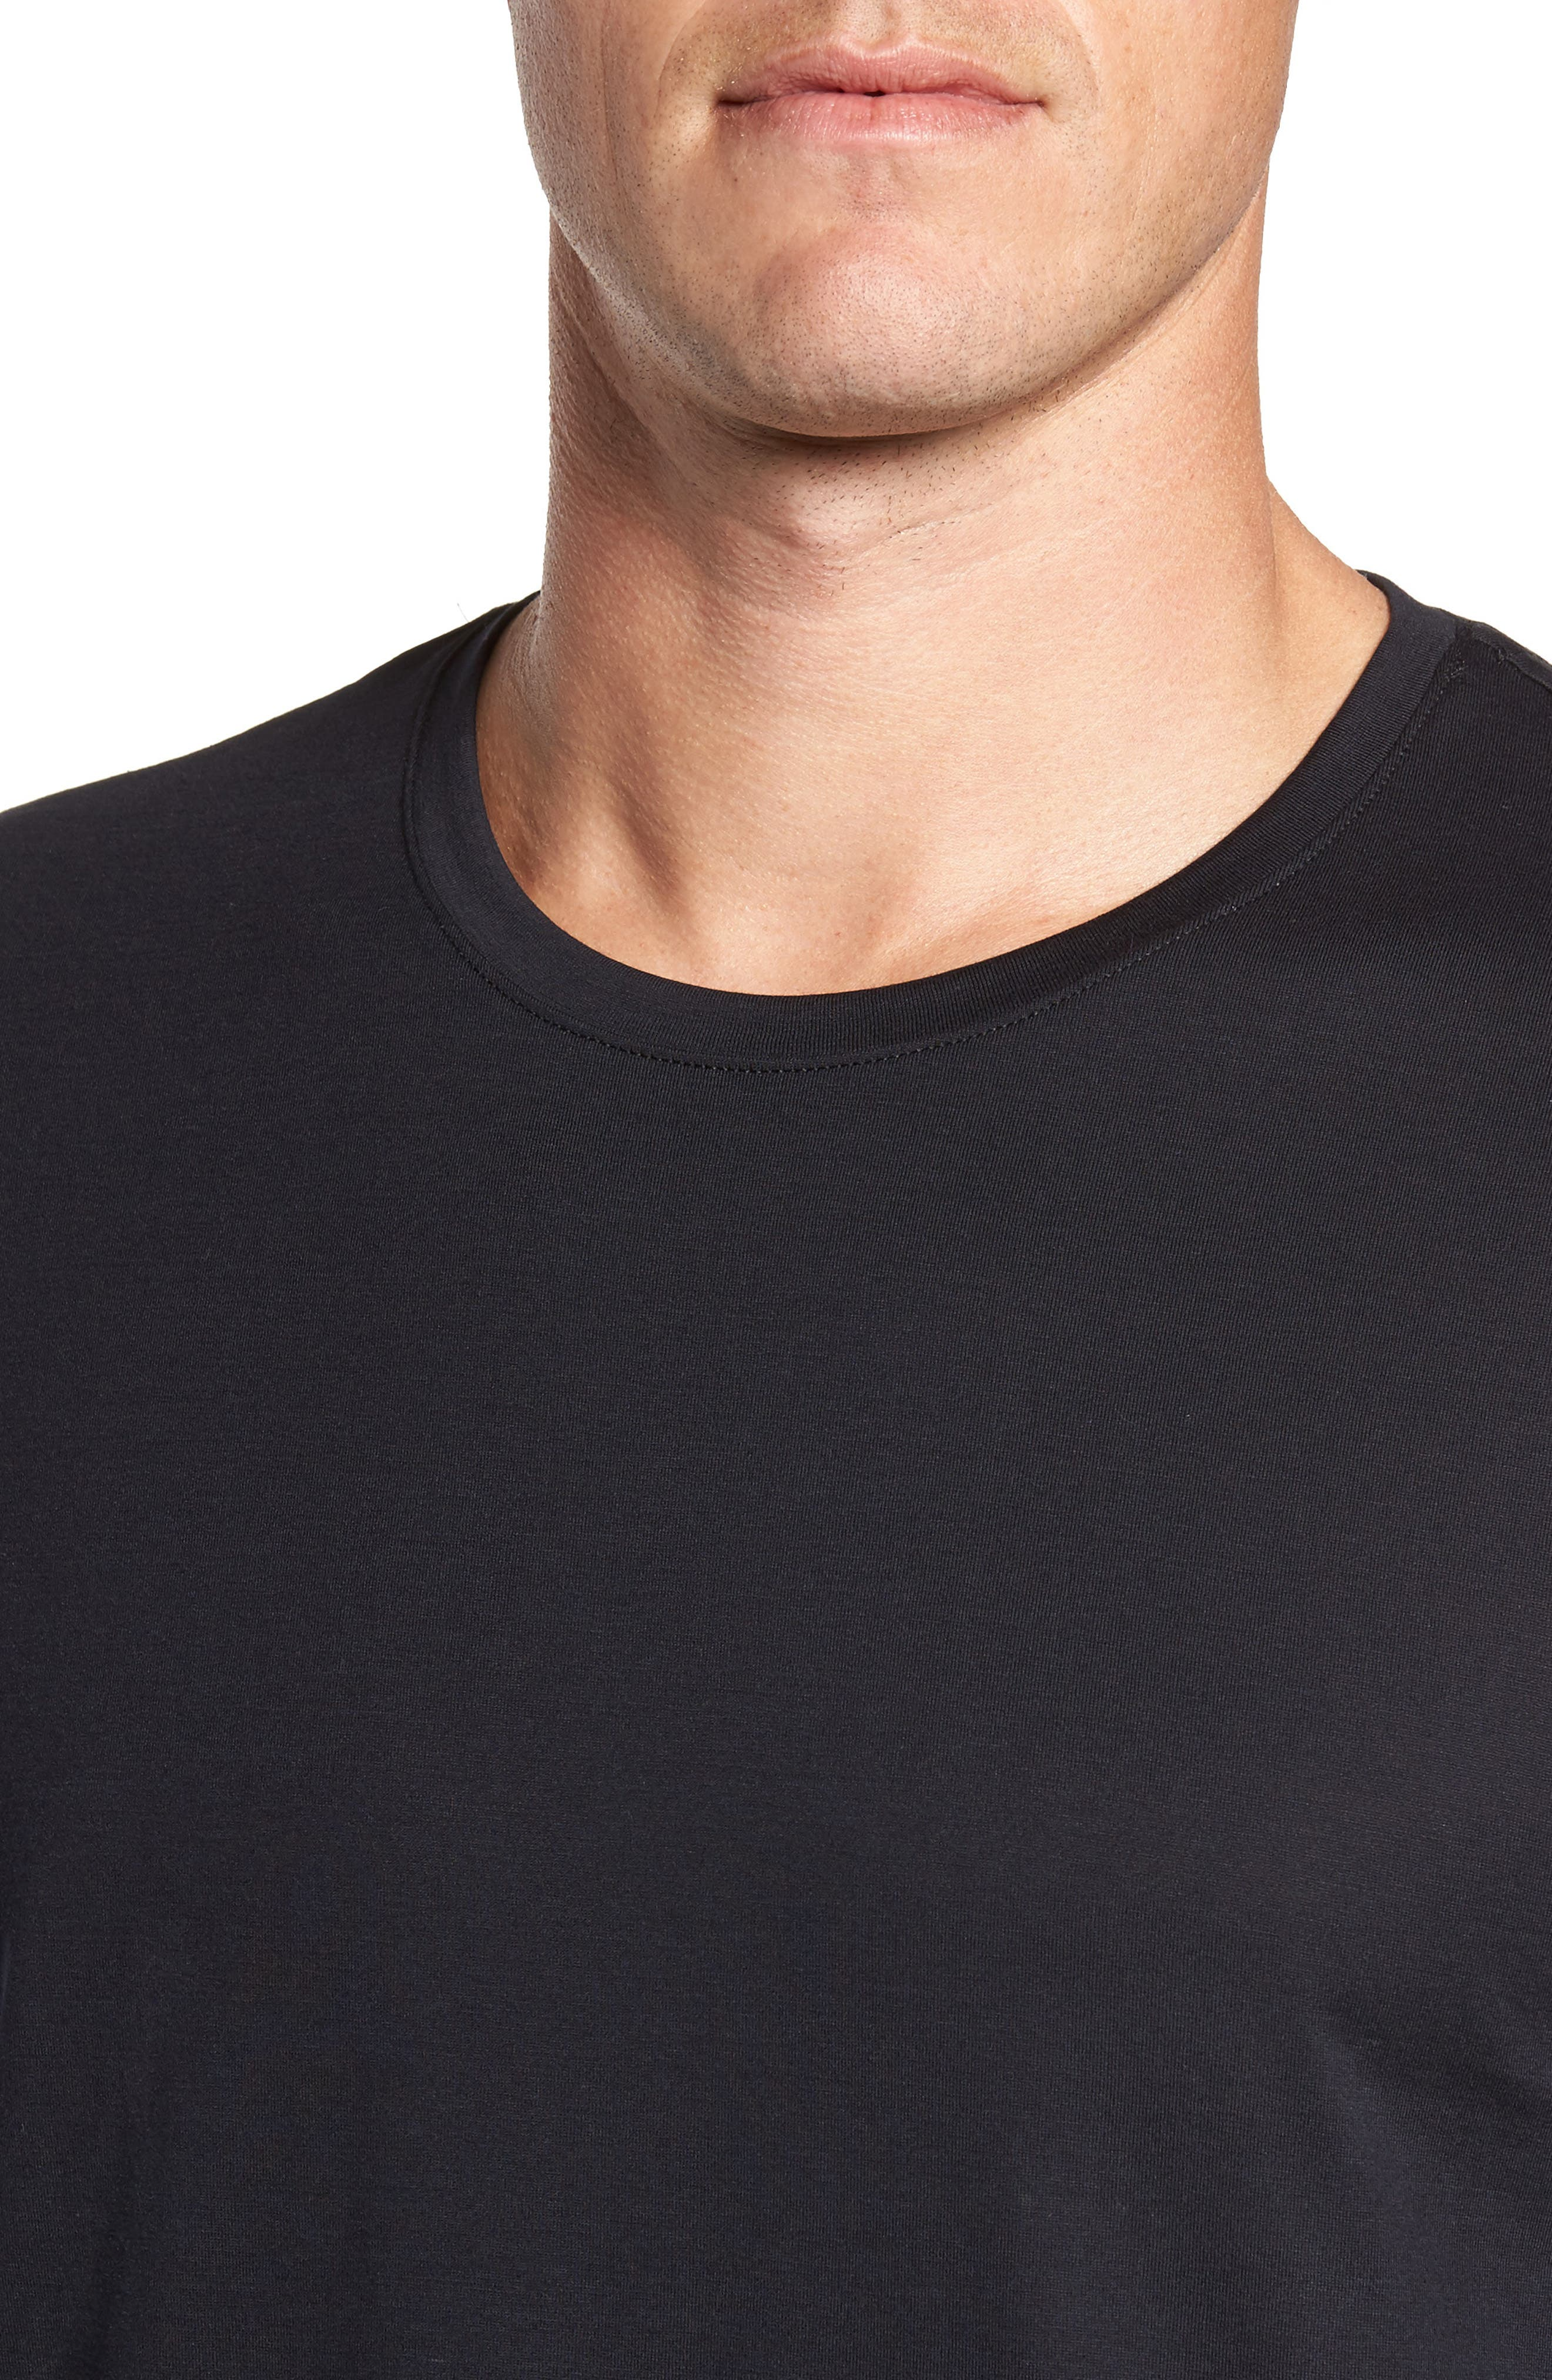 Night & Day Lounge T-Shirt,                             Alternate thumbnail 4, color,                             BLACK